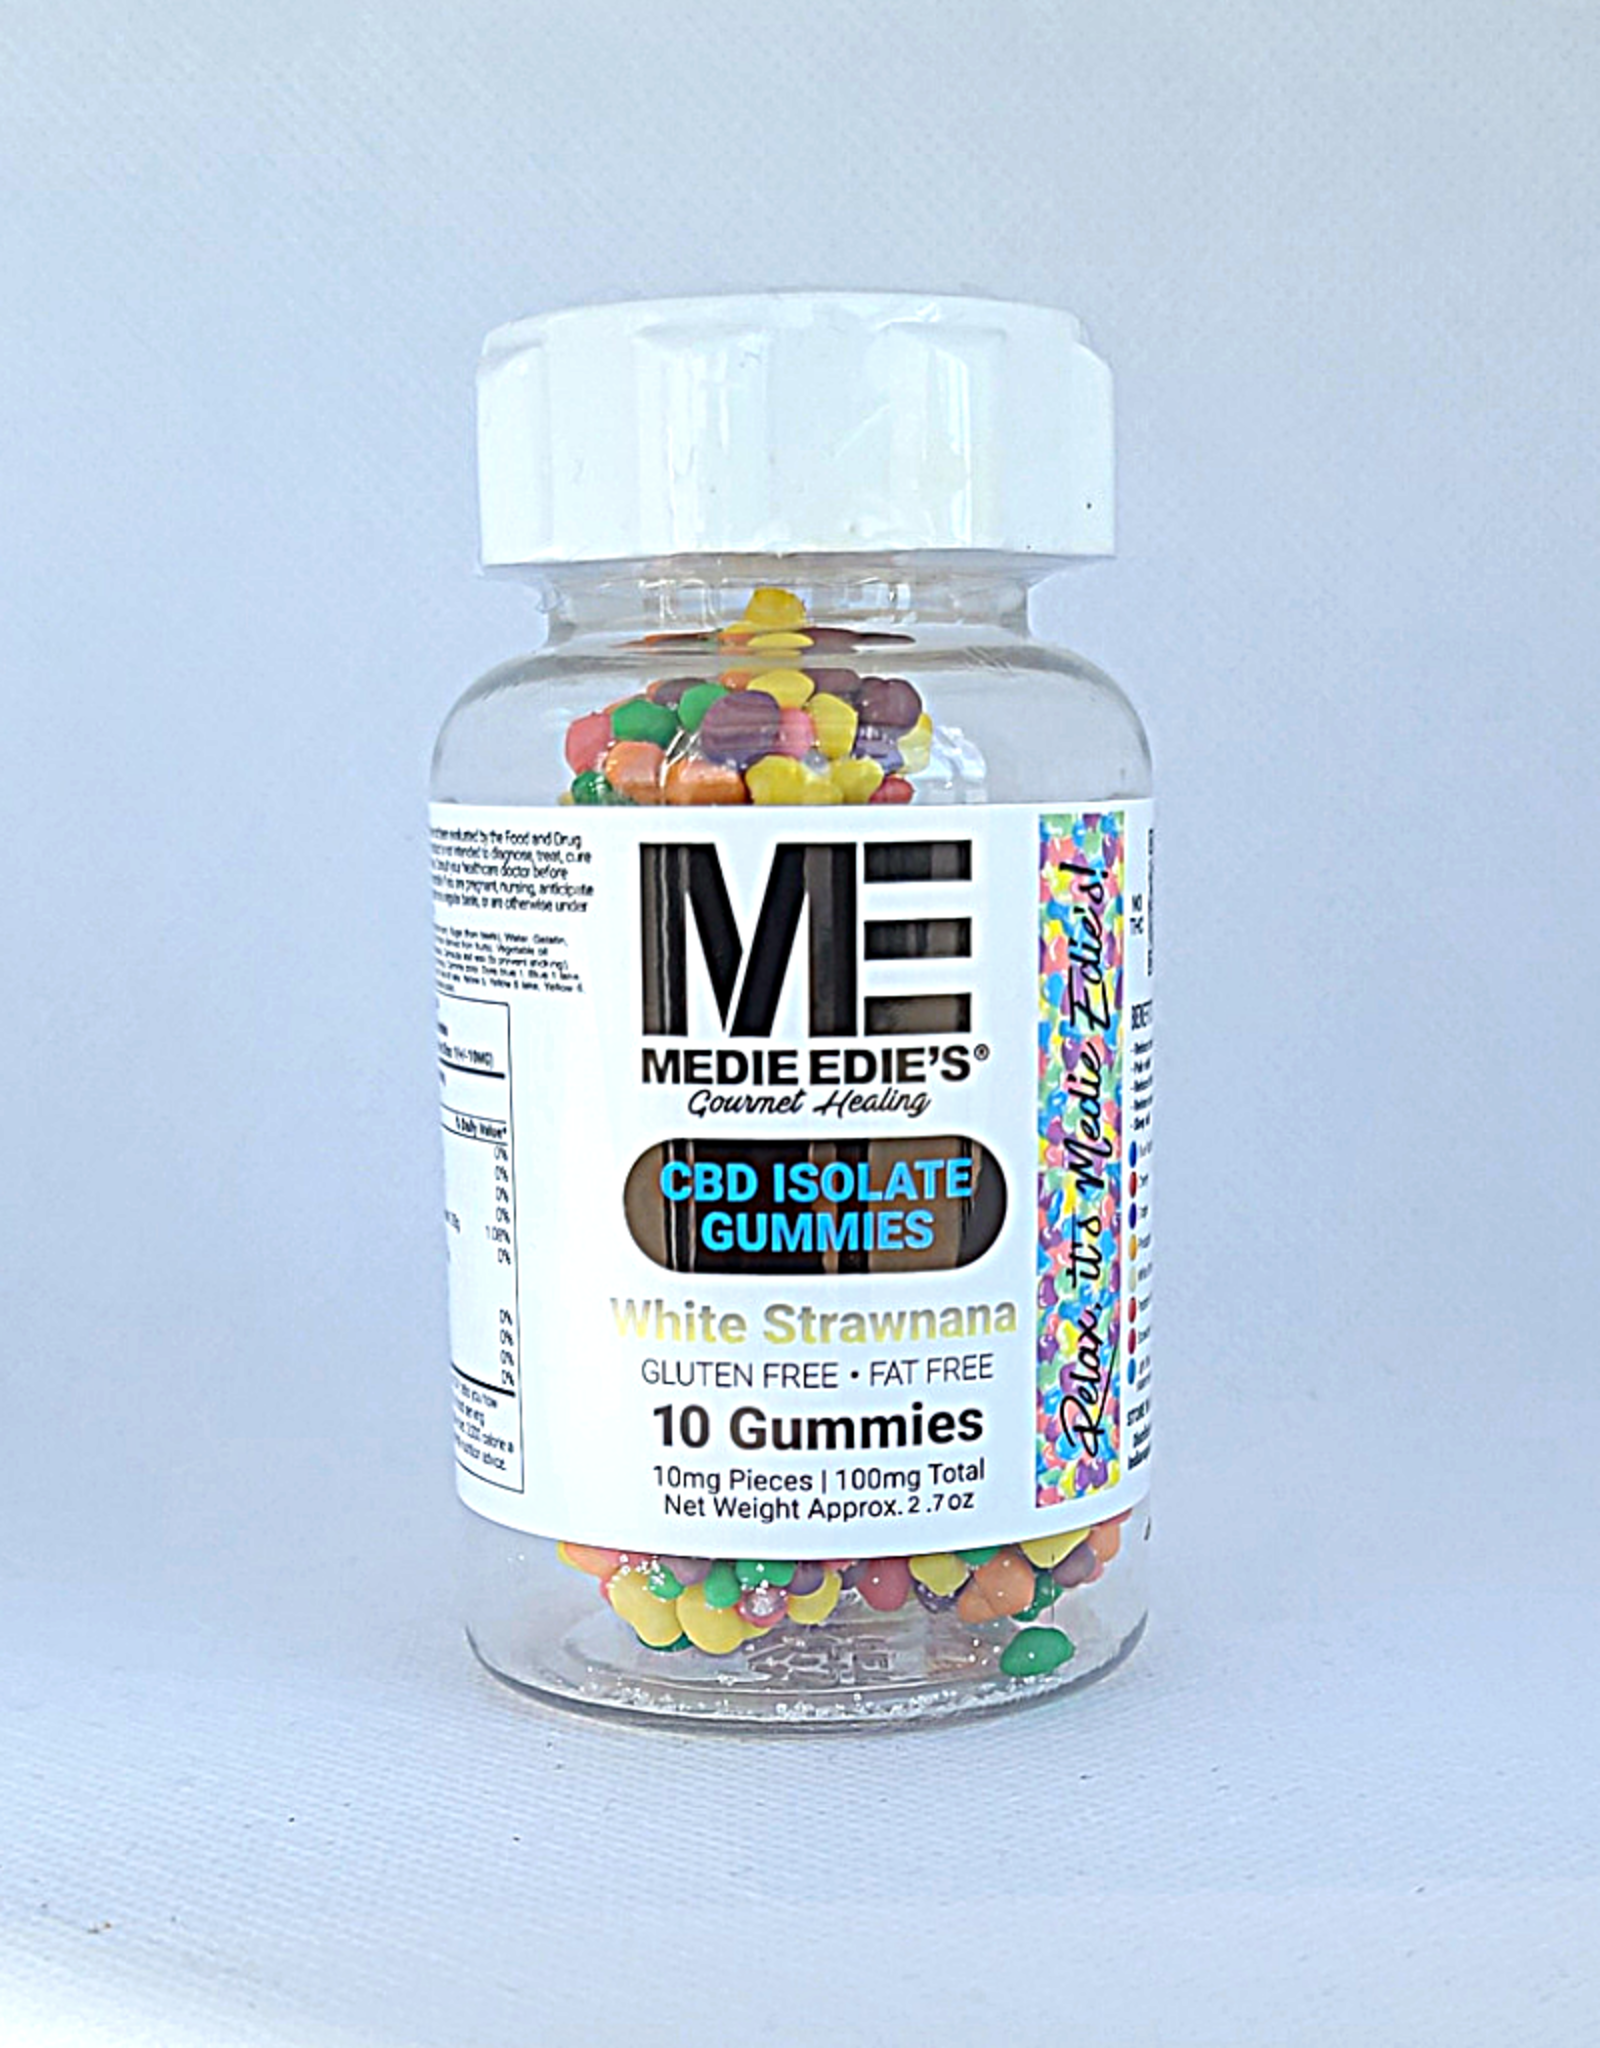 Medie Edie's Pebbled White Strawnana CBD Gummies - 10ct/10mg/100mg